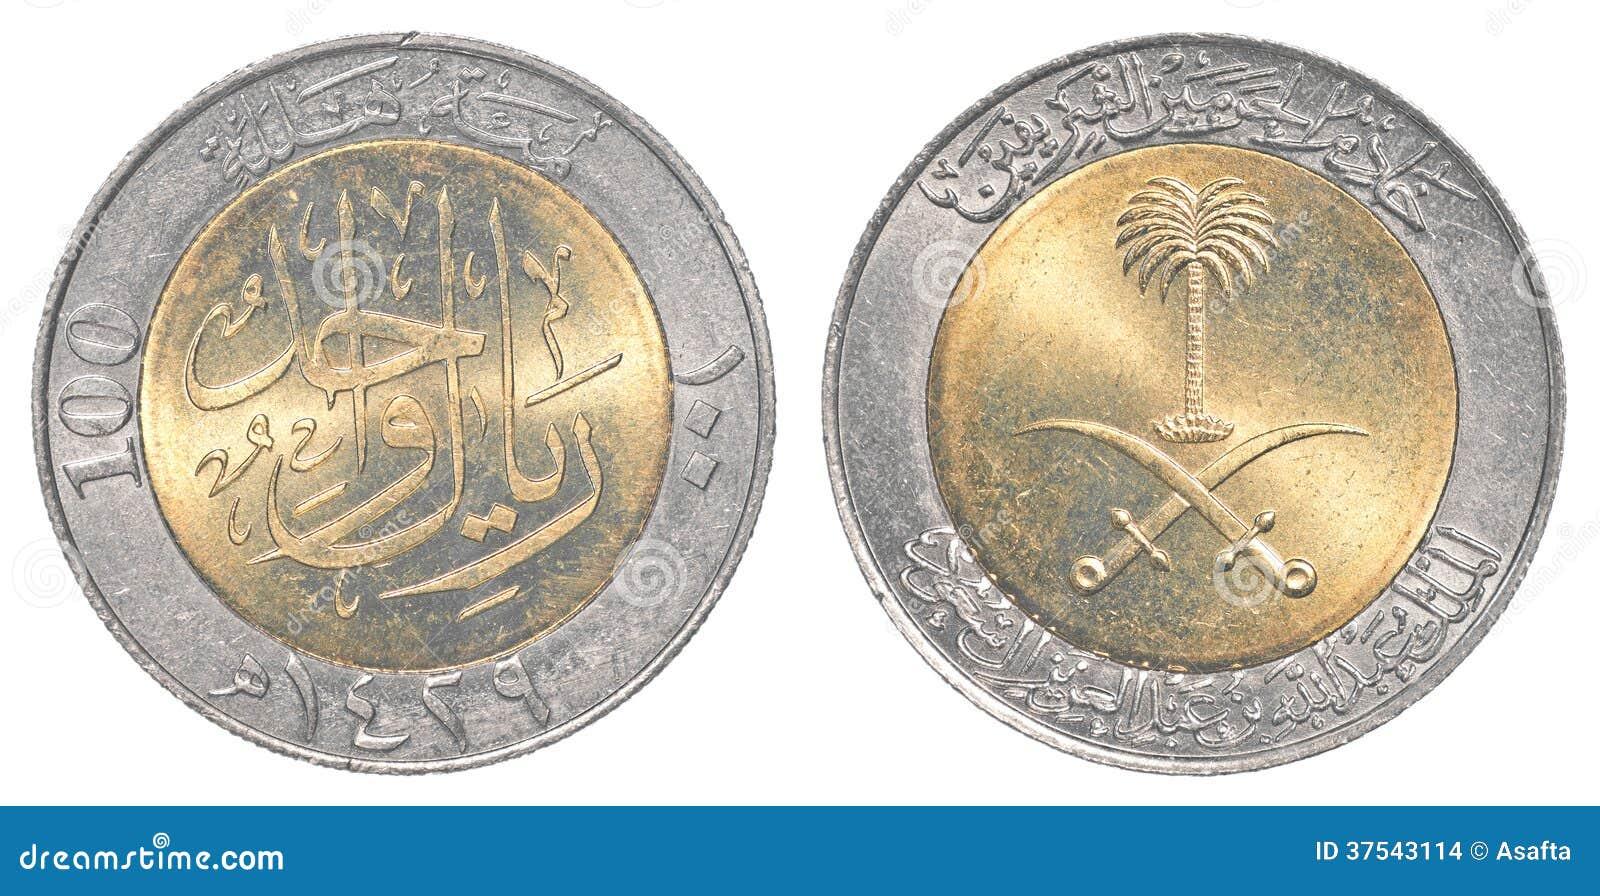 Moneda De Arabia Saudita Del Halala 100 Imagenes de archivo - Imagen: 37543114 Saudi Money 100